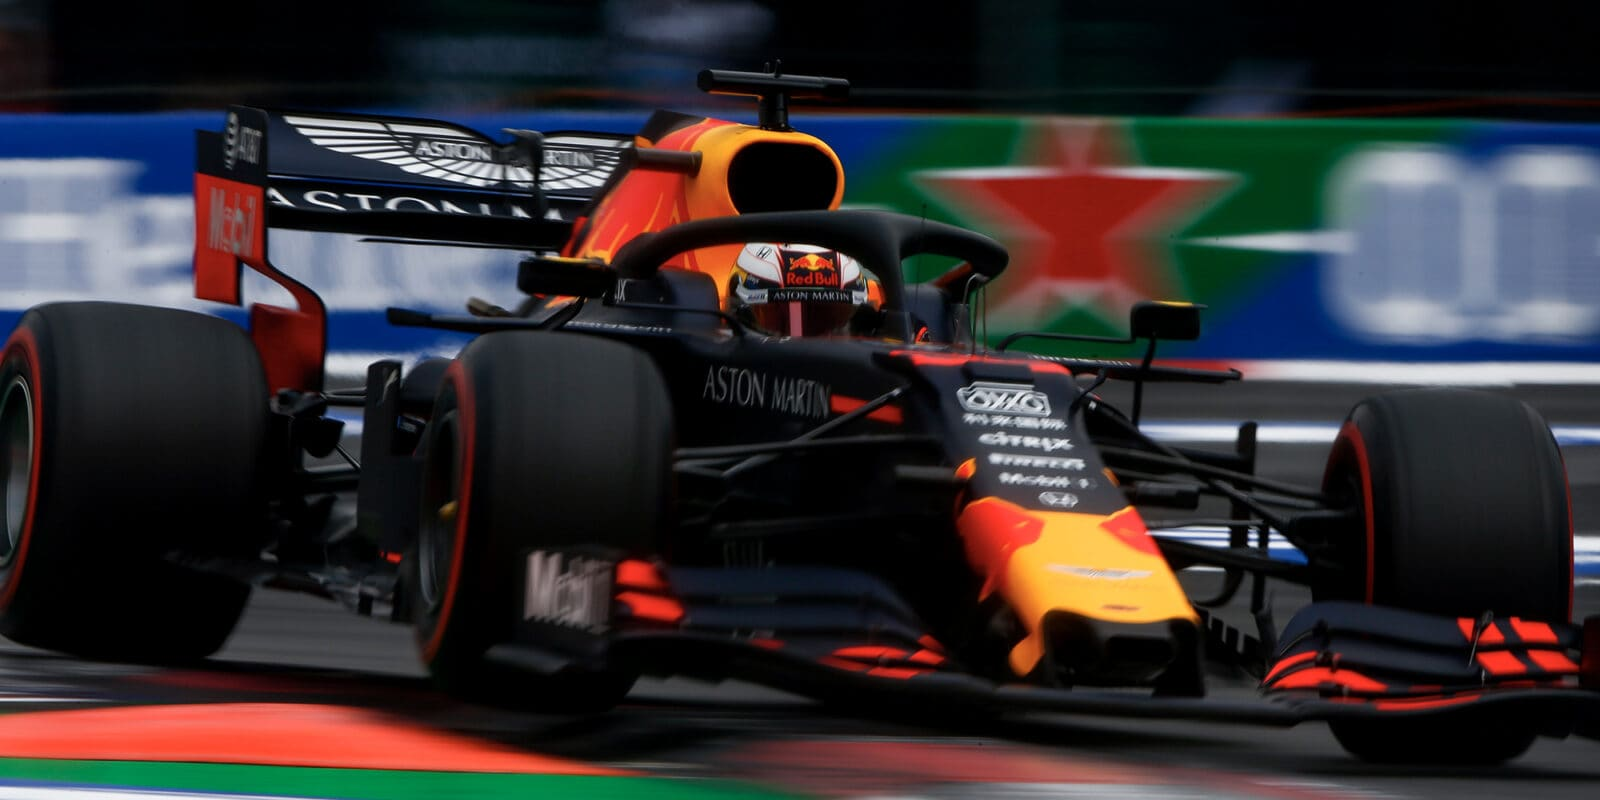 Verstappen: Penalizaci měl dostat i Hamilton